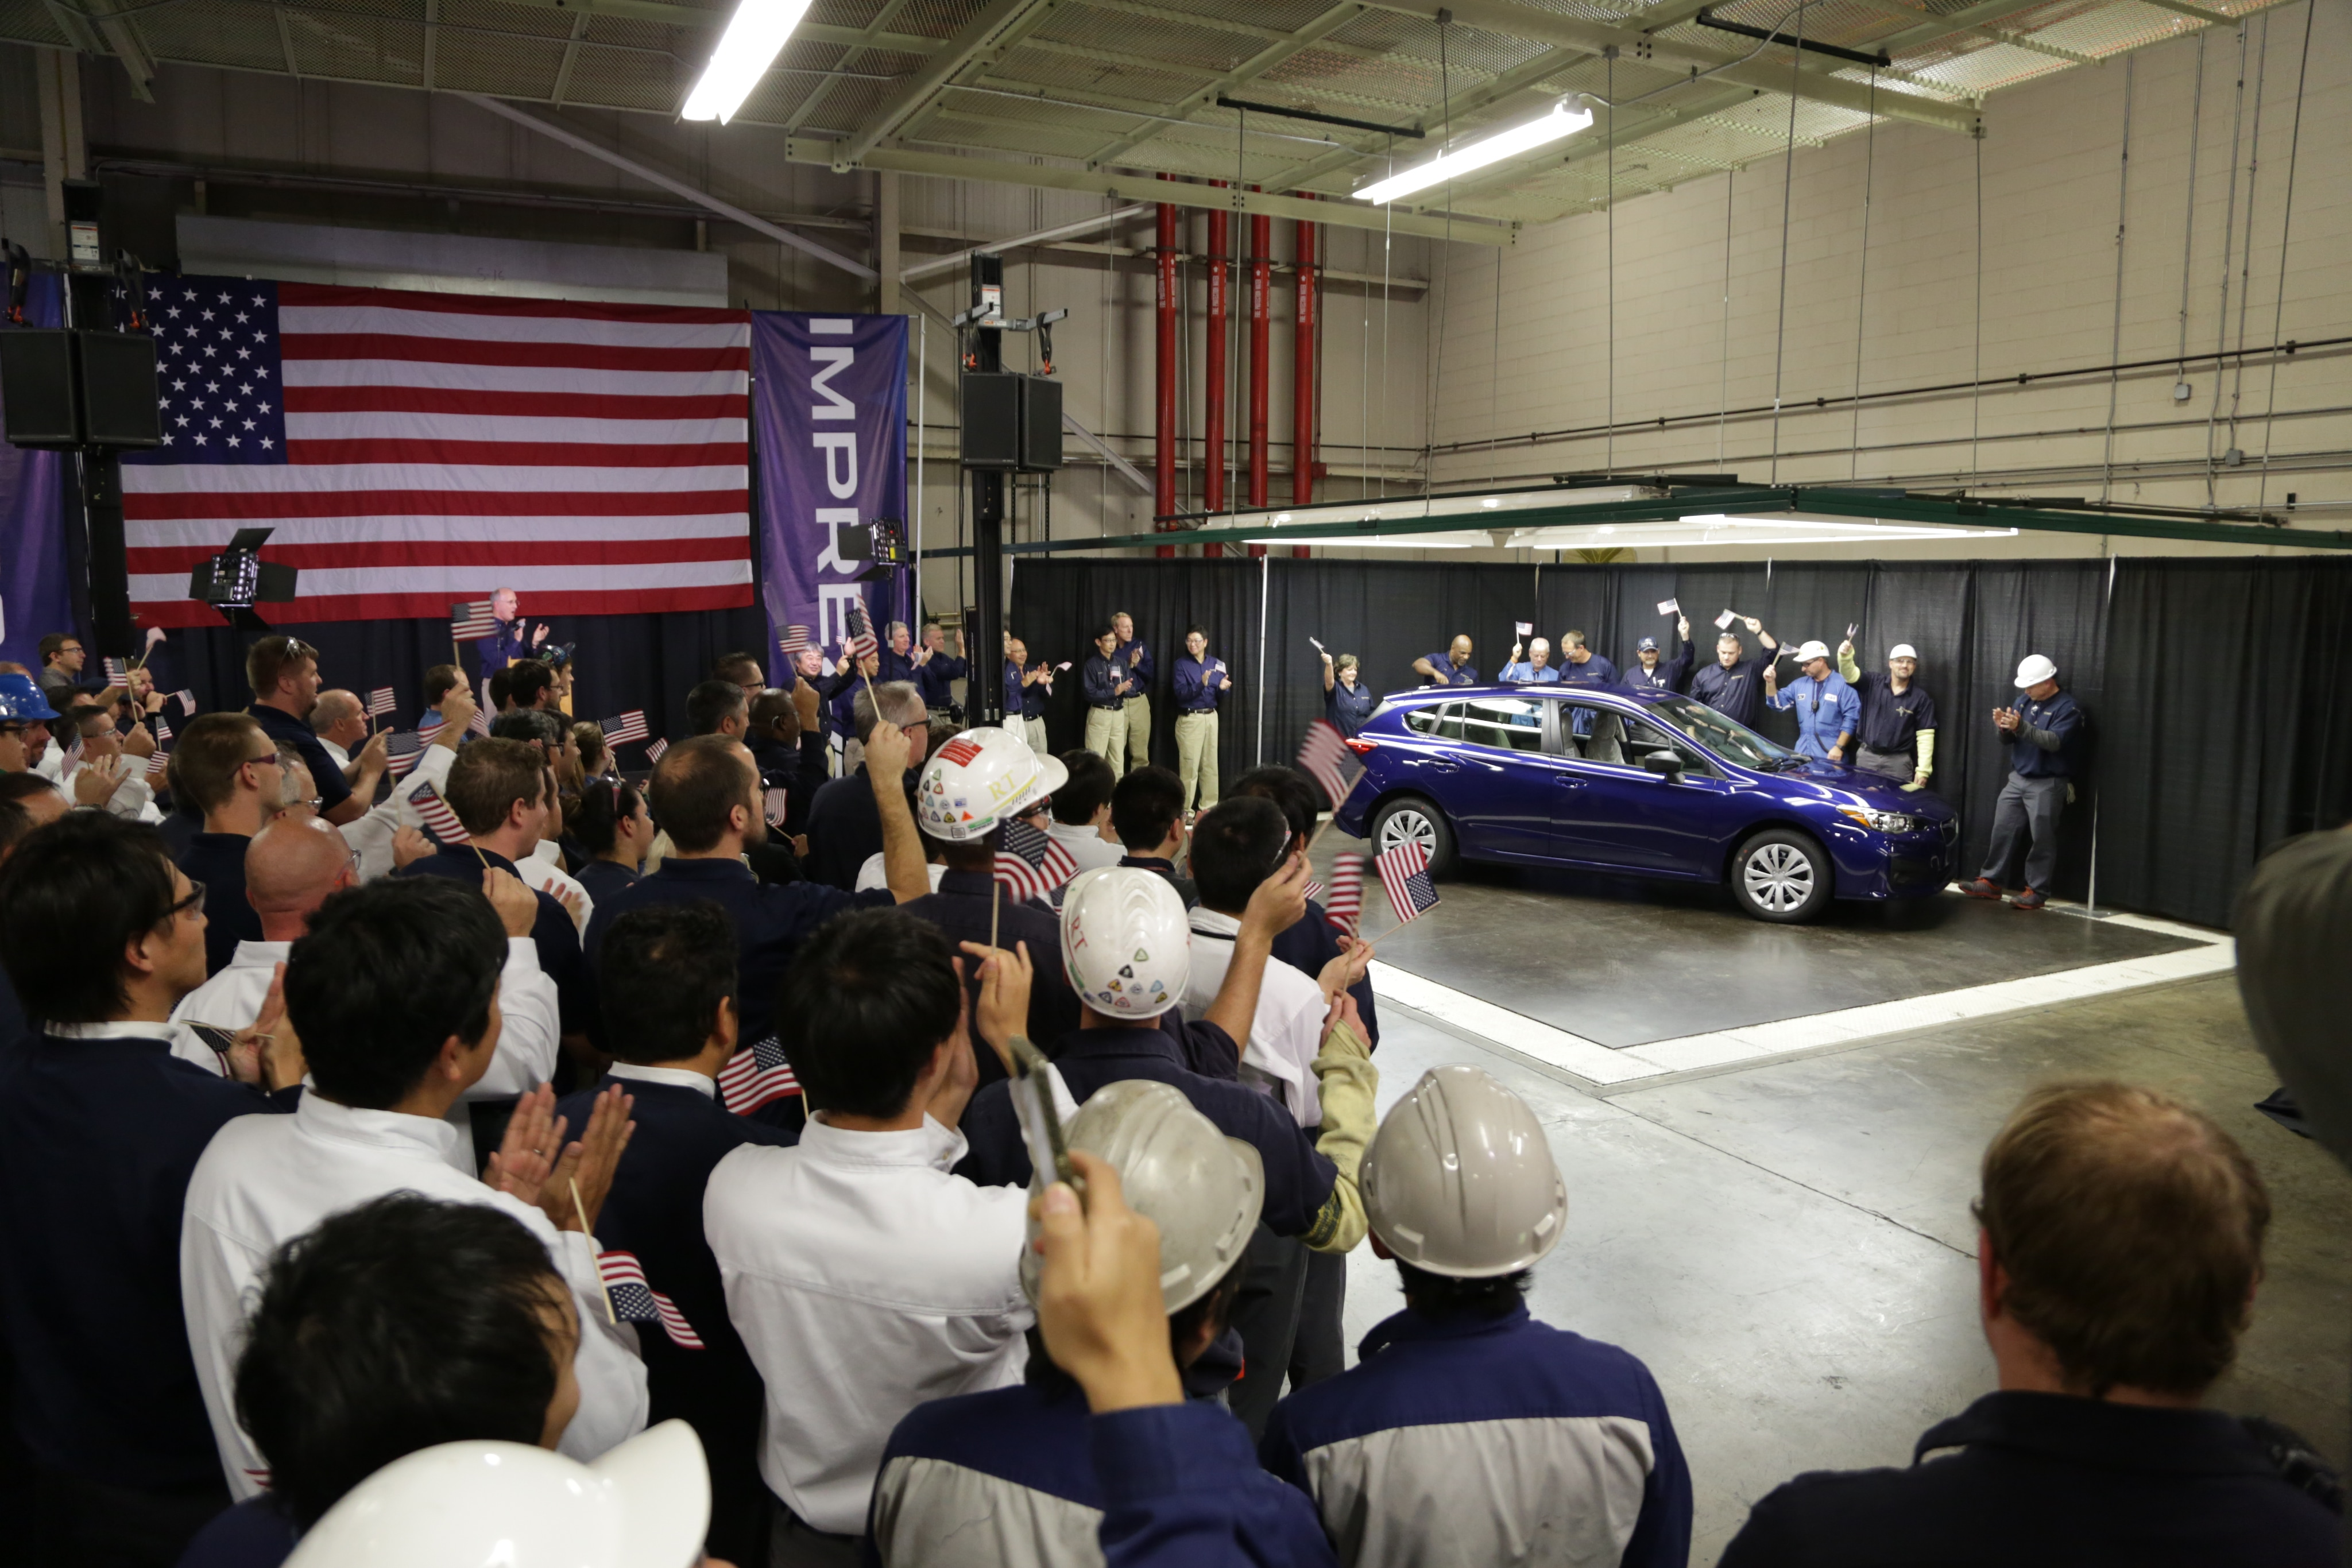 Adventure Subaru | FIRST AMERICAN-MADE SUBARU IMPREZA ROLLS OFF ...